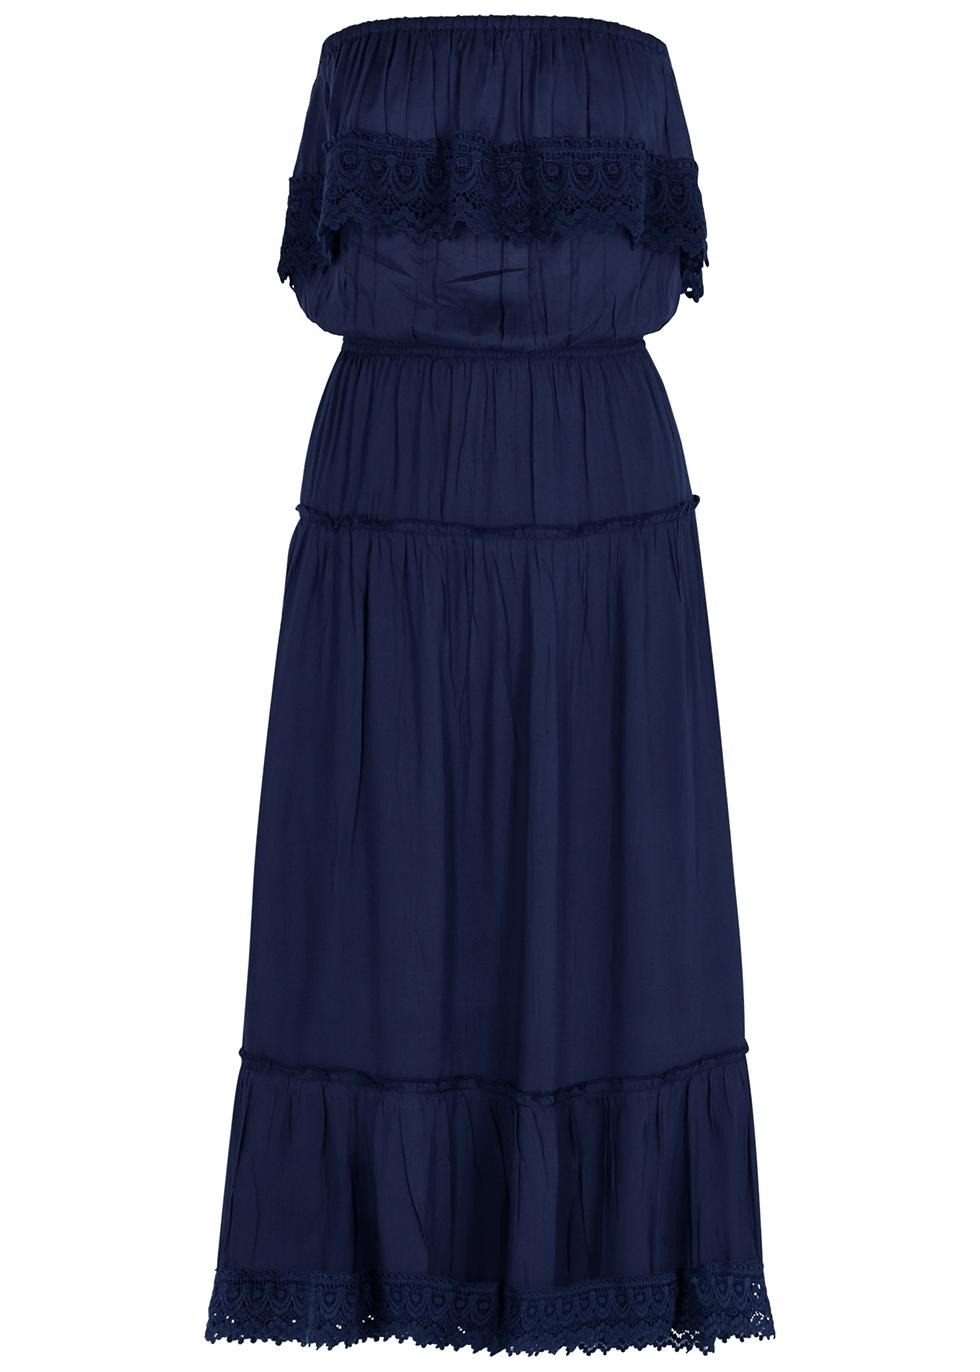 Clara crochet-trimmed rayon midi dress